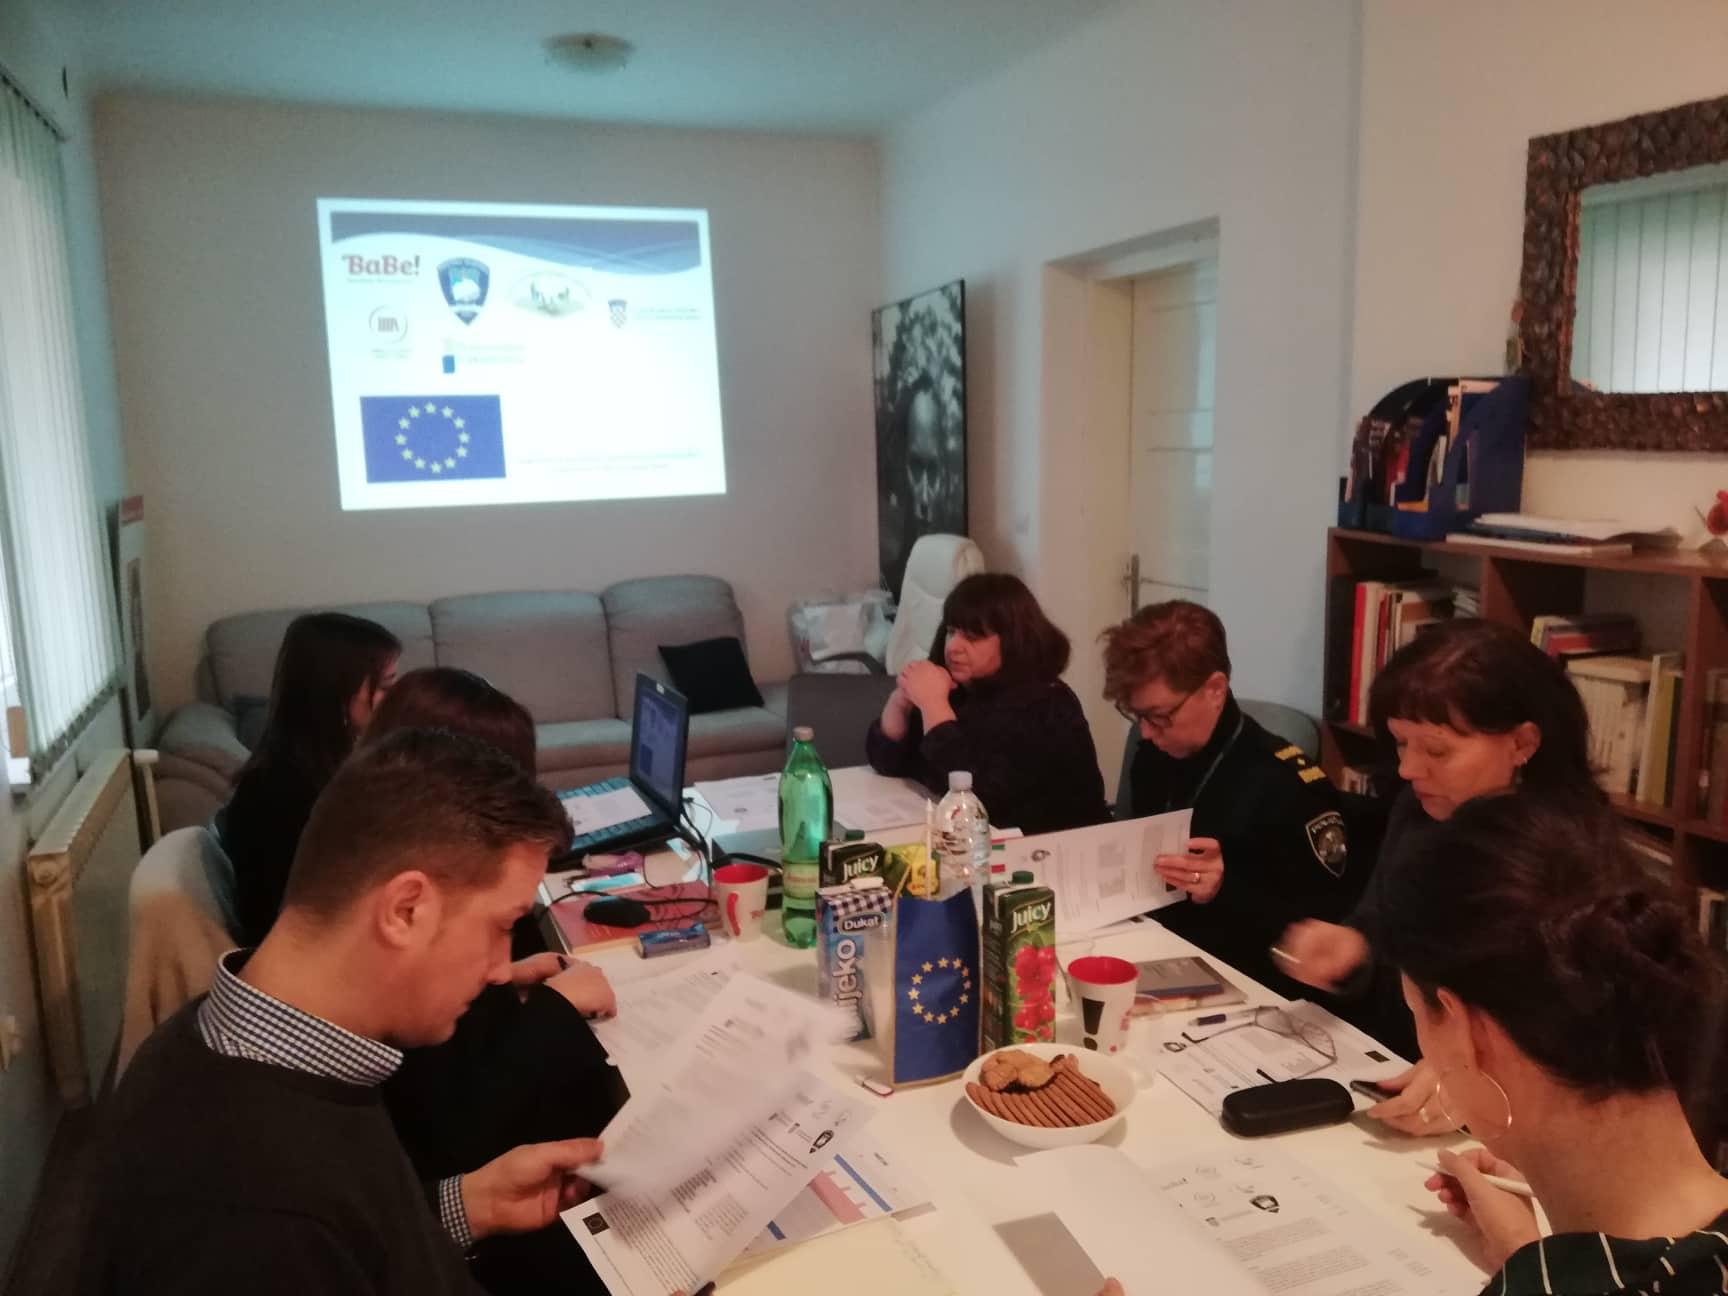 Održan kickoff sastanak u okviru projekta How Expertise Leads to Prevention, Learning, Identification, Networking and Ending Gender Based Violence (HELPLINE)